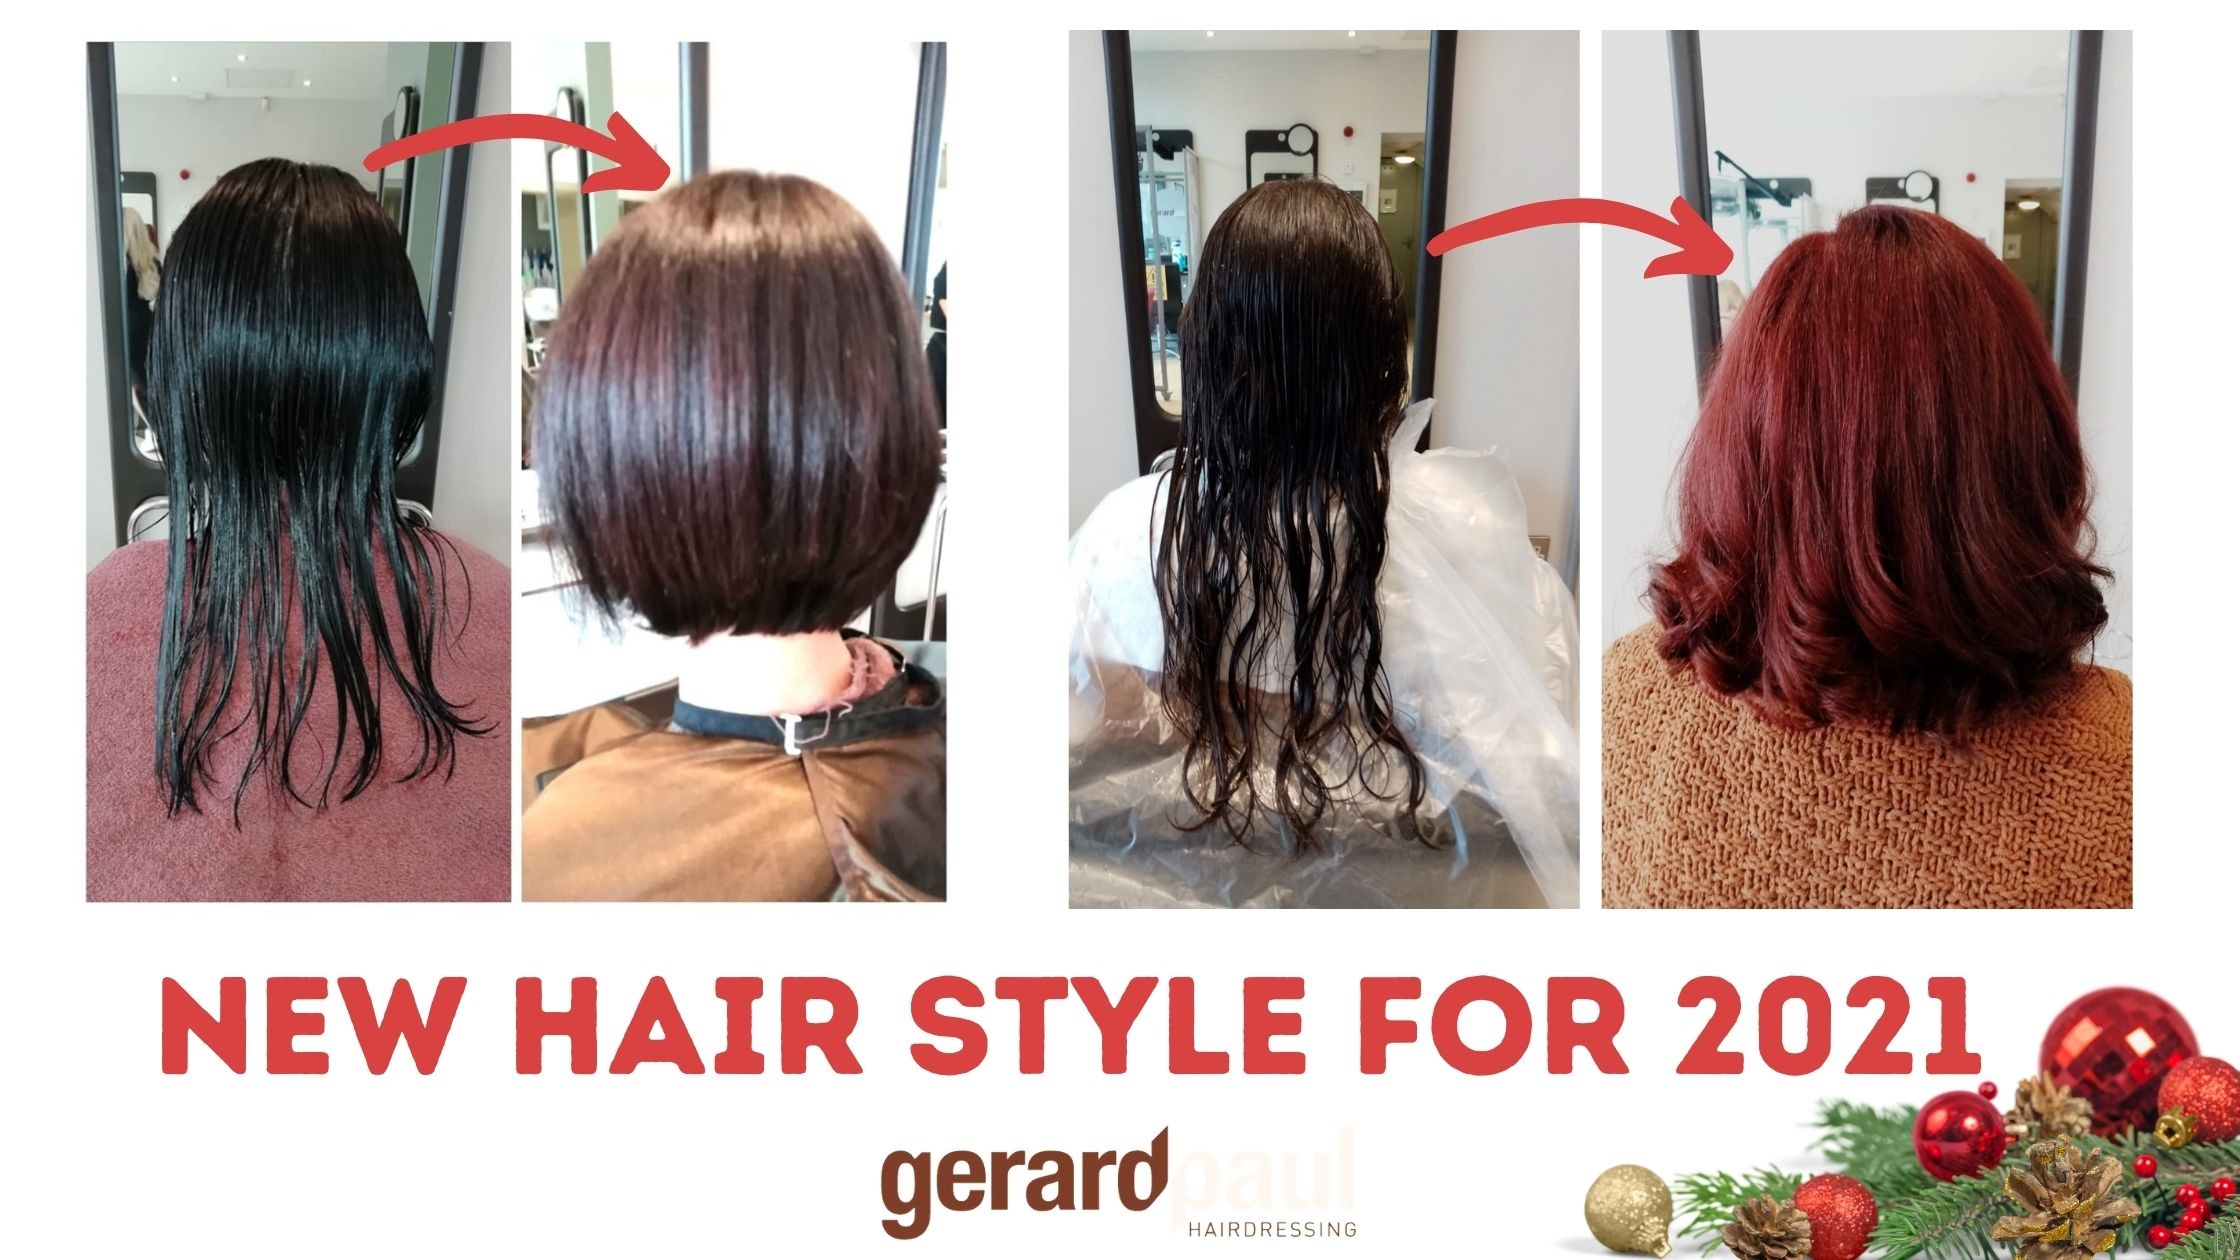 Gerard Paul Hairdressing salon Dublin and Naas